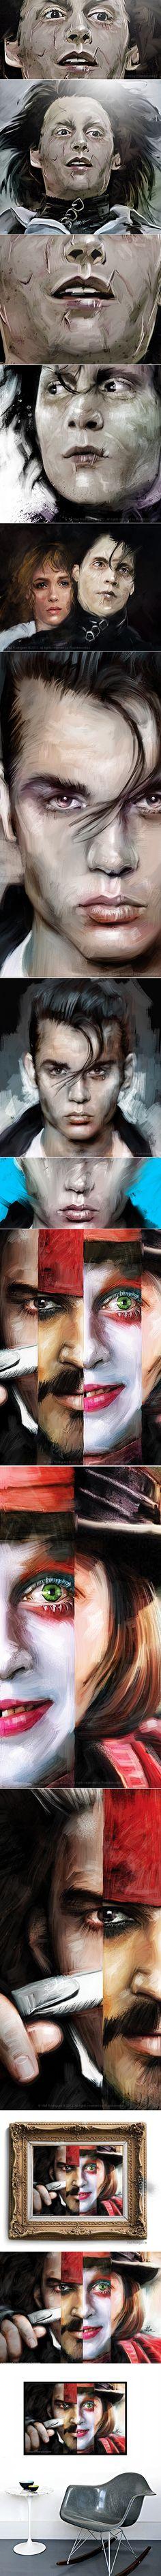 Many Faces of Johnny Depp by Vlad Rodriguez, via Behance